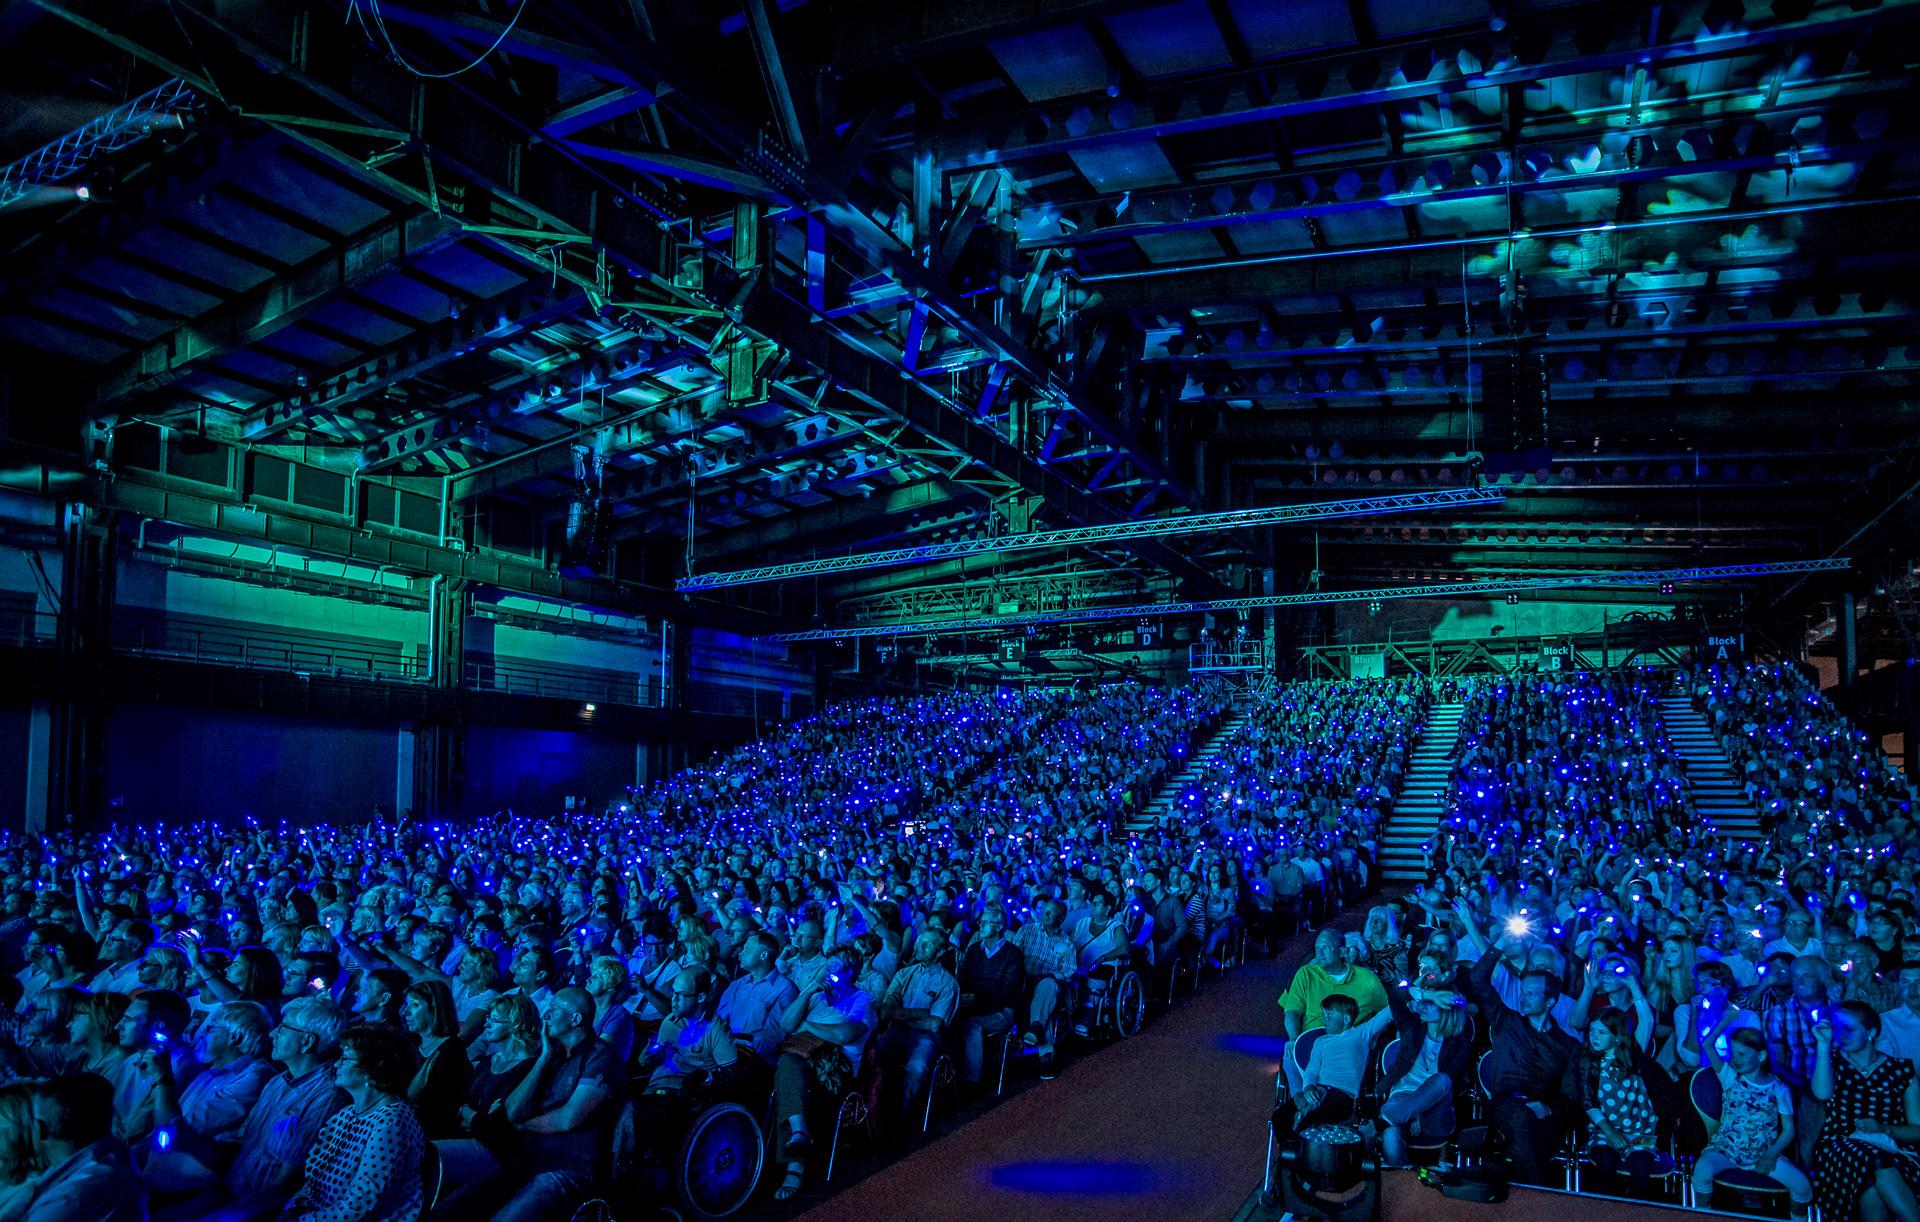 POP MEETS CLASSIC - Veranstaltungsdesign 2016 Lokhalle Göttingen